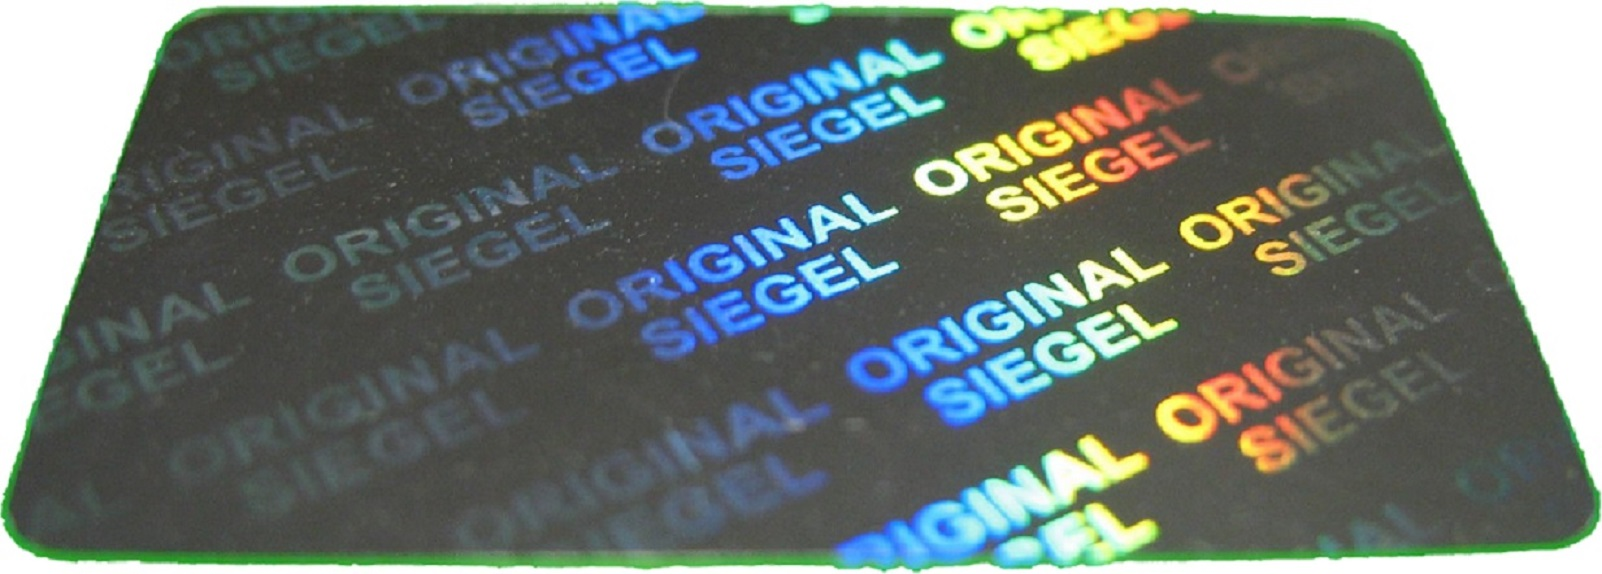 Hologramm-Aufkleber Siegel, 17x30mm silber, Garantiesiegel, Sicherheitsetikett